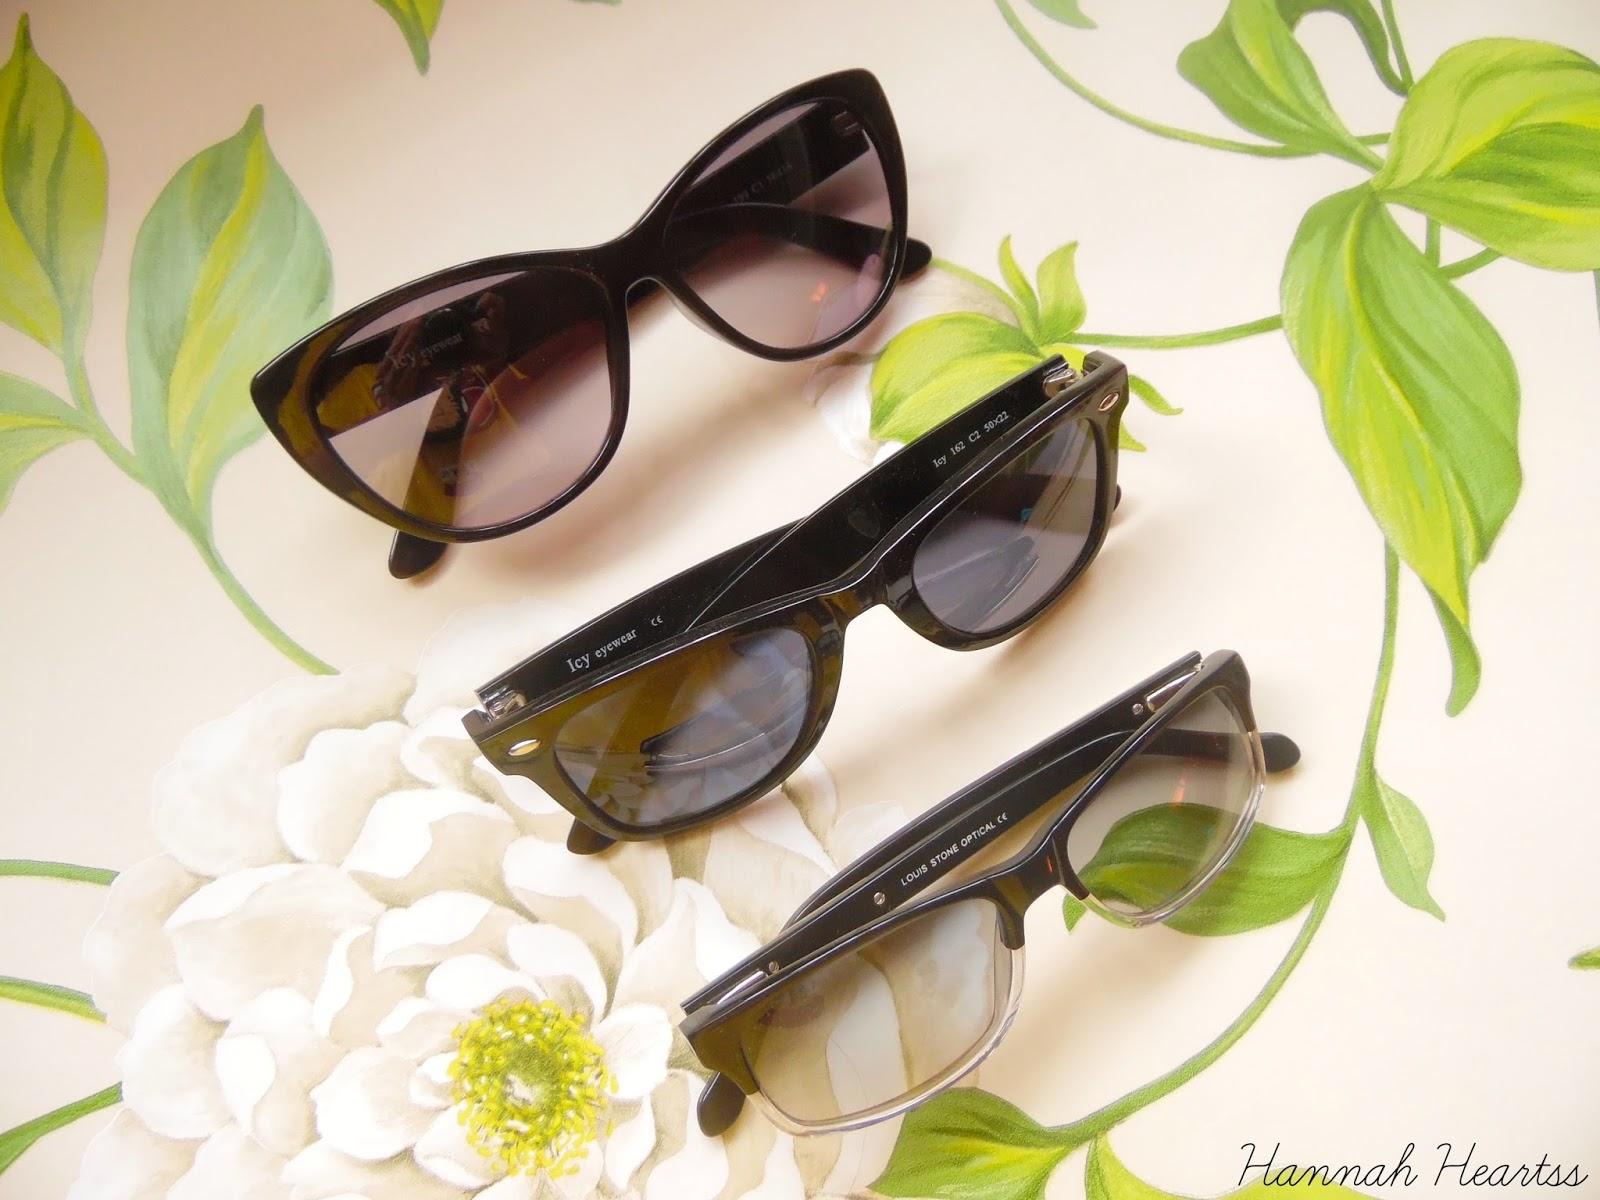 Specspost Sunglasses Home Trial